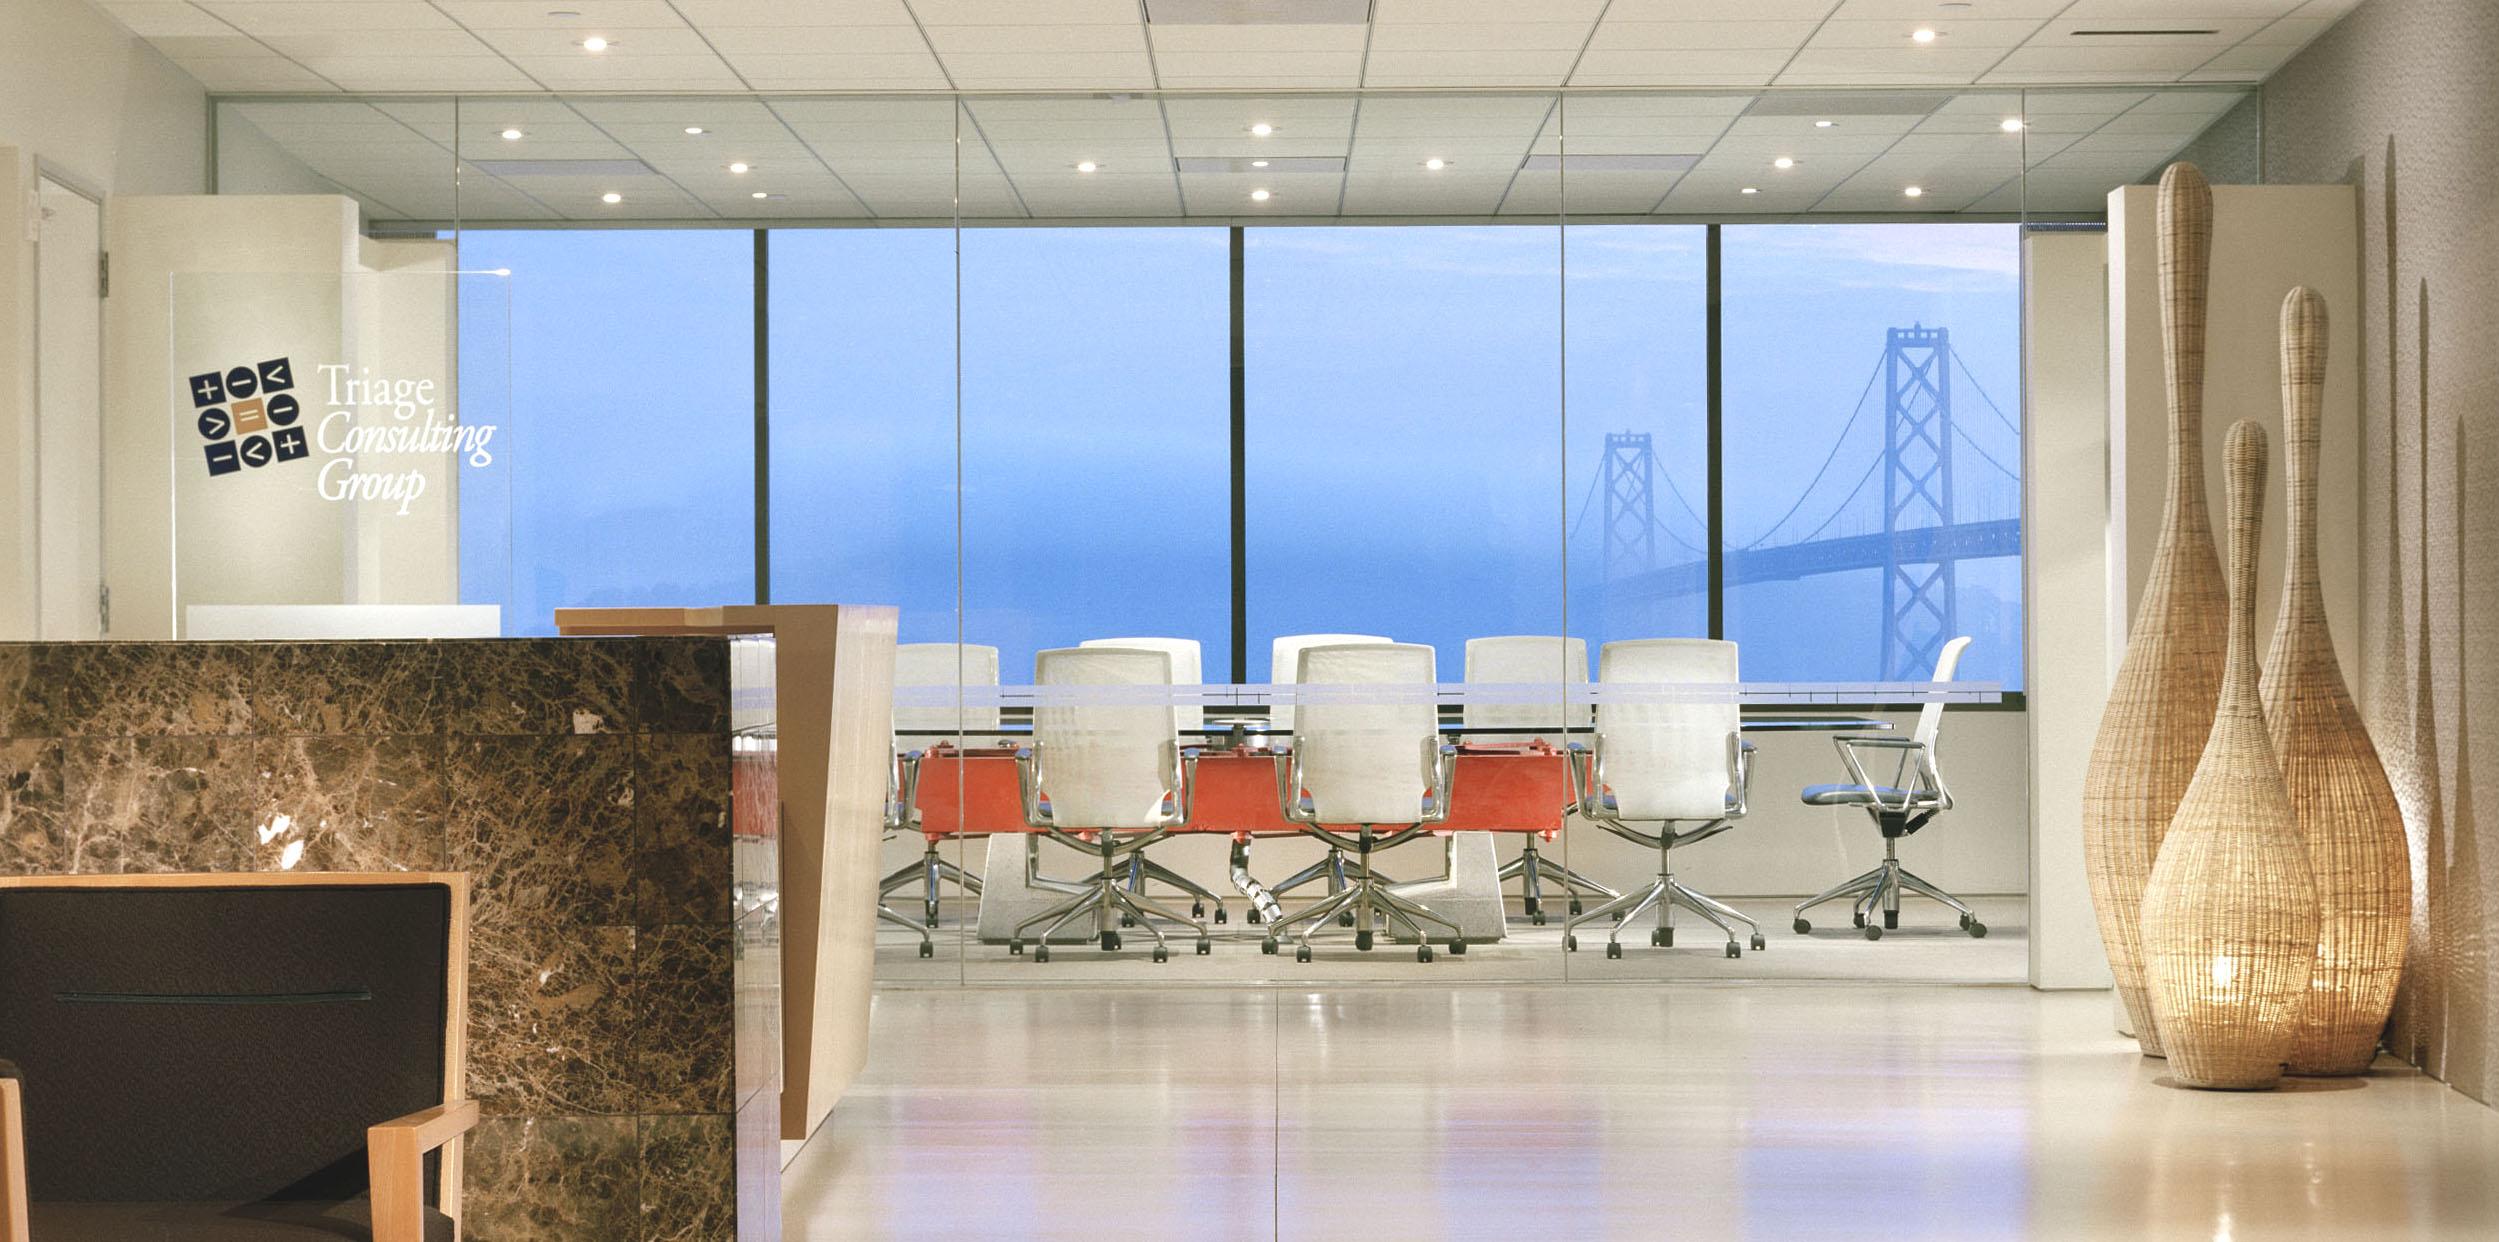 Golden Gate Conference Table.jpg